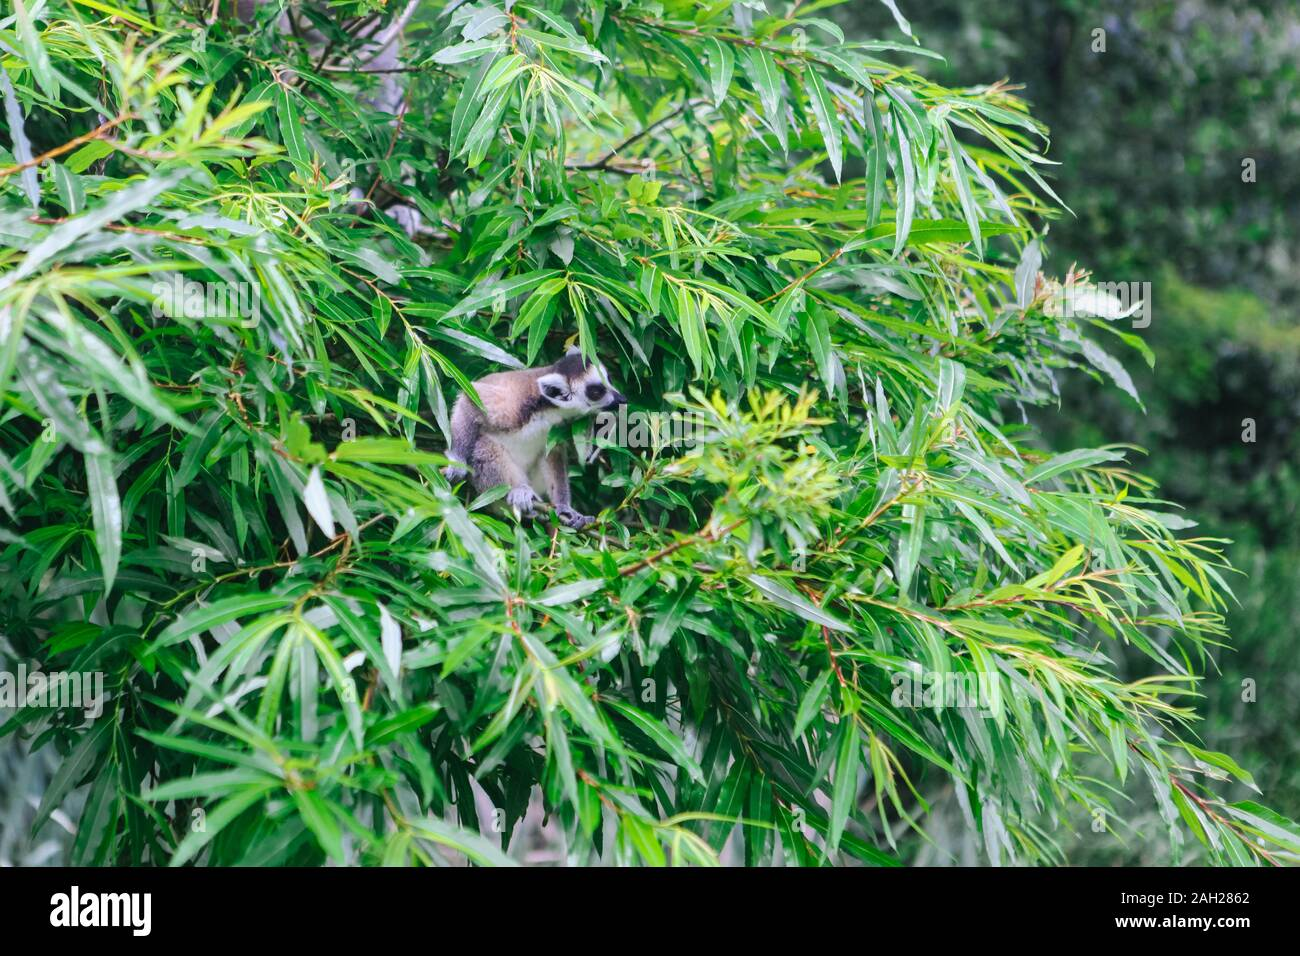 Follaje Tela Tropical de Vida Silvestre-vegetación Elefante Tigre Jirafa